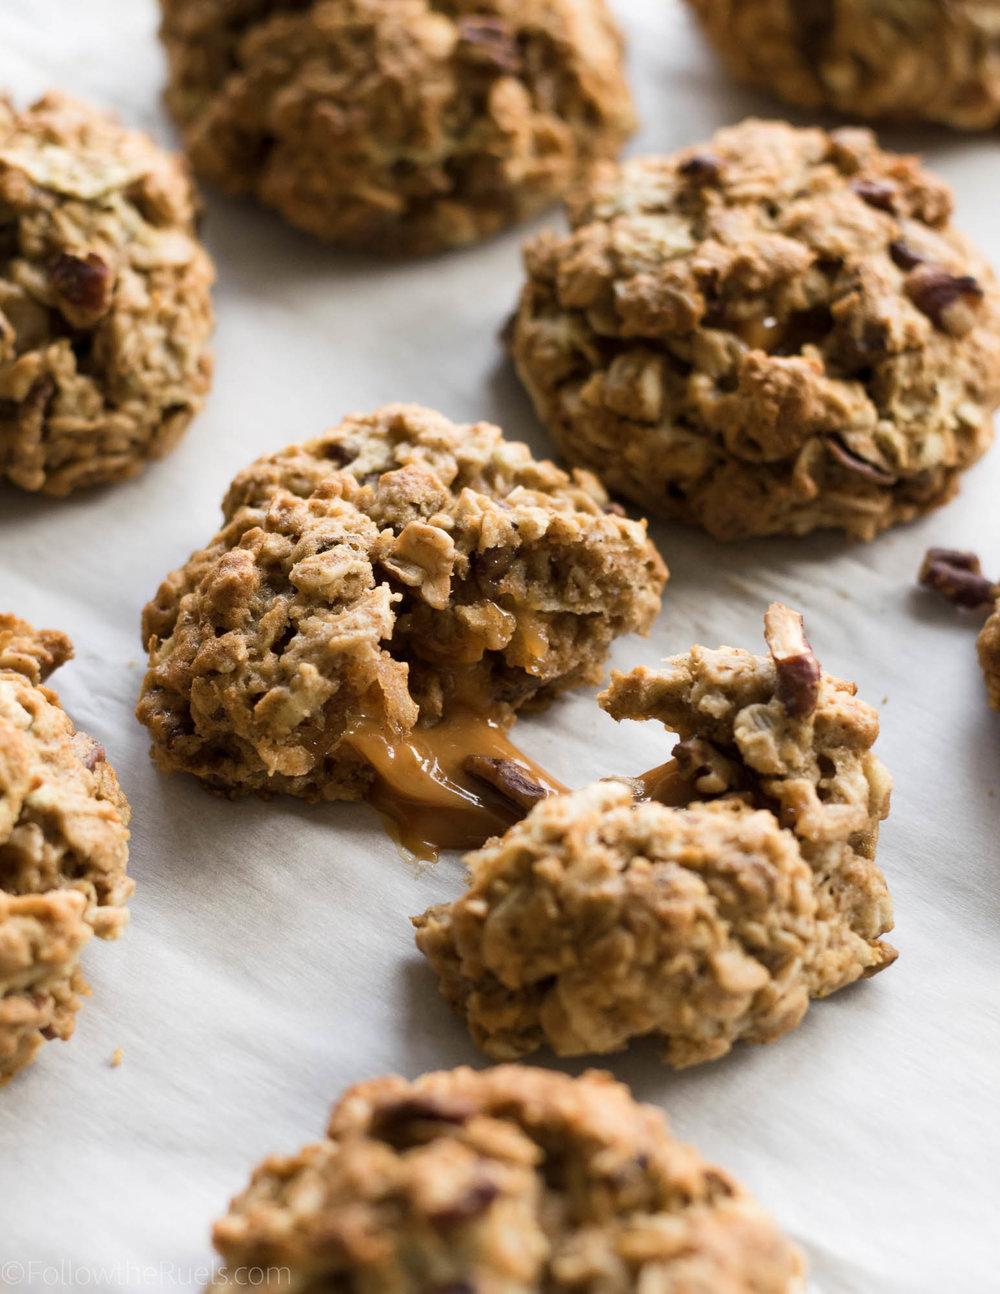 Caramel-Apple-Oatmeal-Cookies-10.jpg